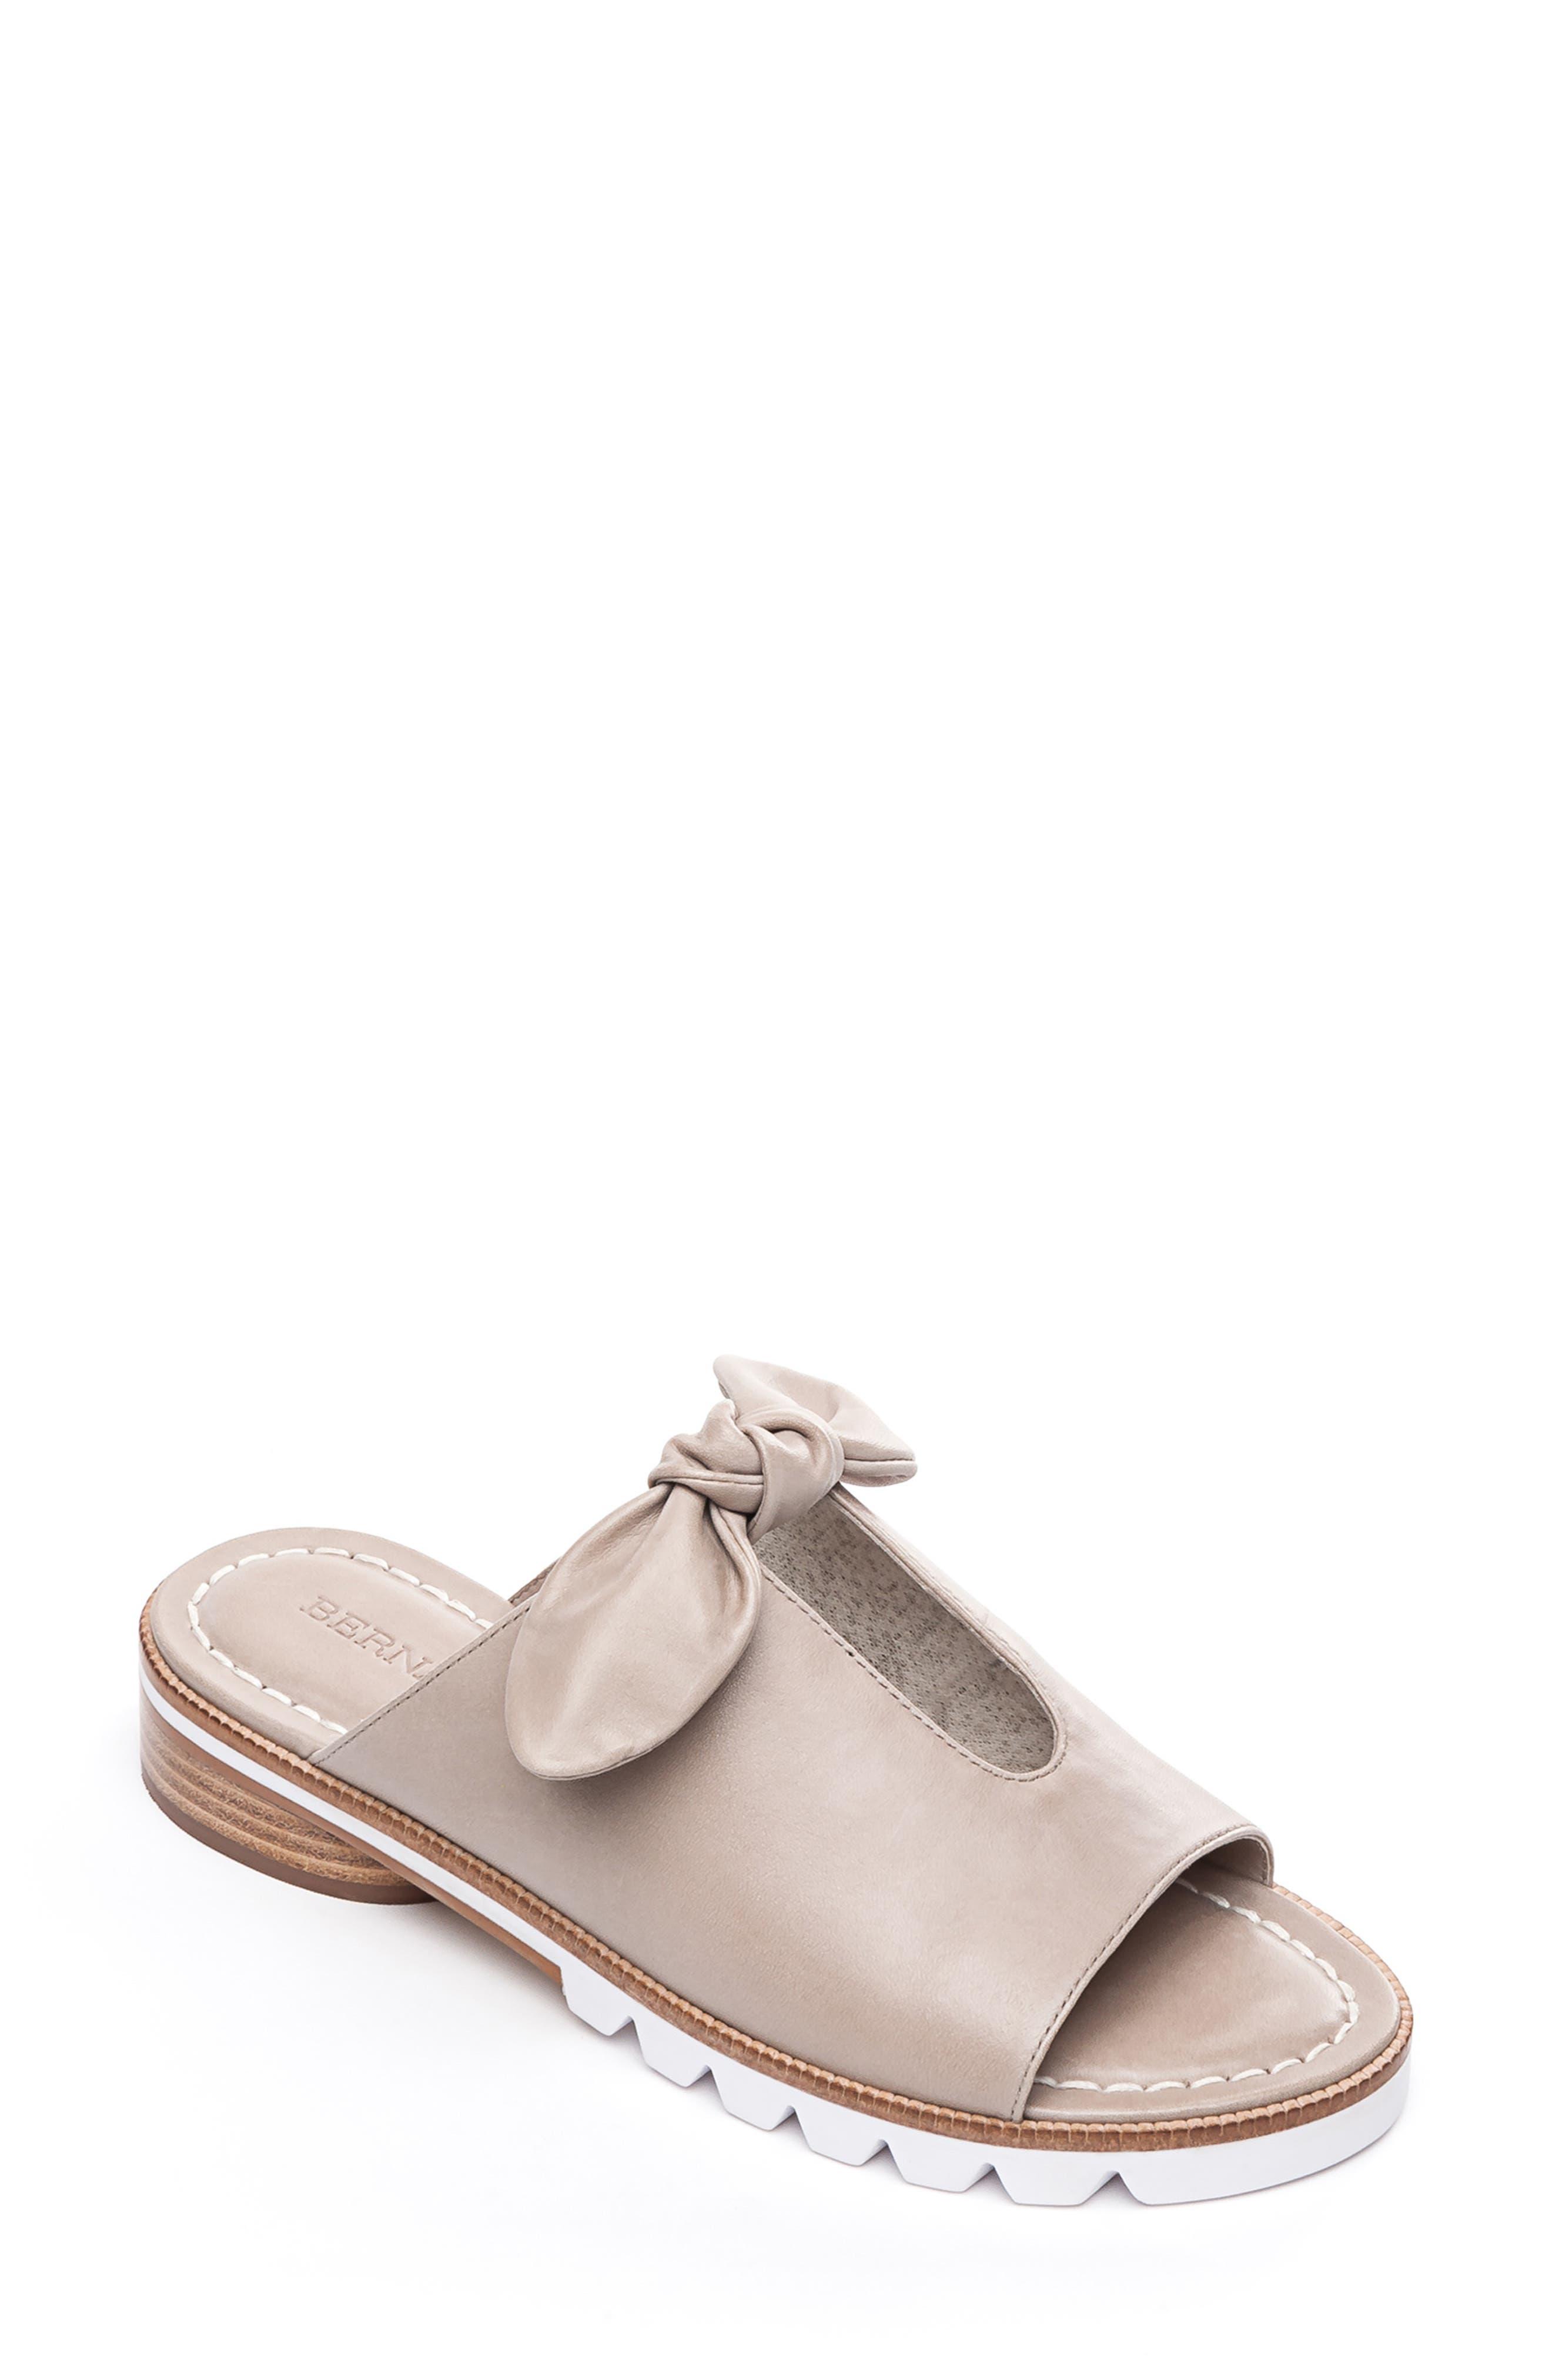 65df5a8553df Bernardo Alice Bow Slide Sandal